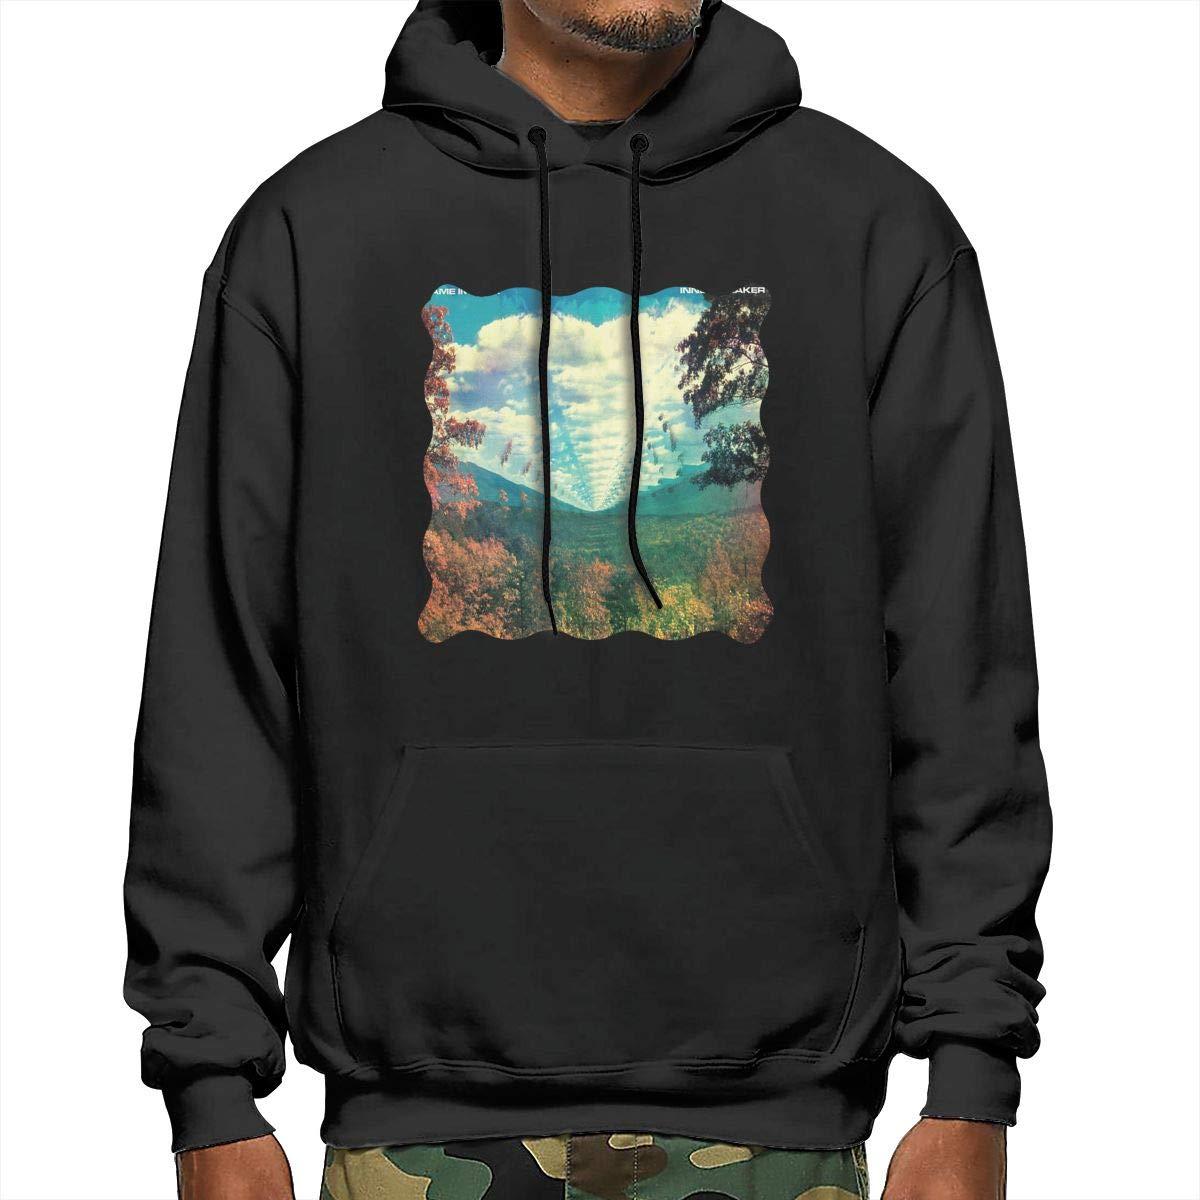 Opanjyajk Tame Impala InnerSpeaker Mens Pullover Hooded Sweatshirt